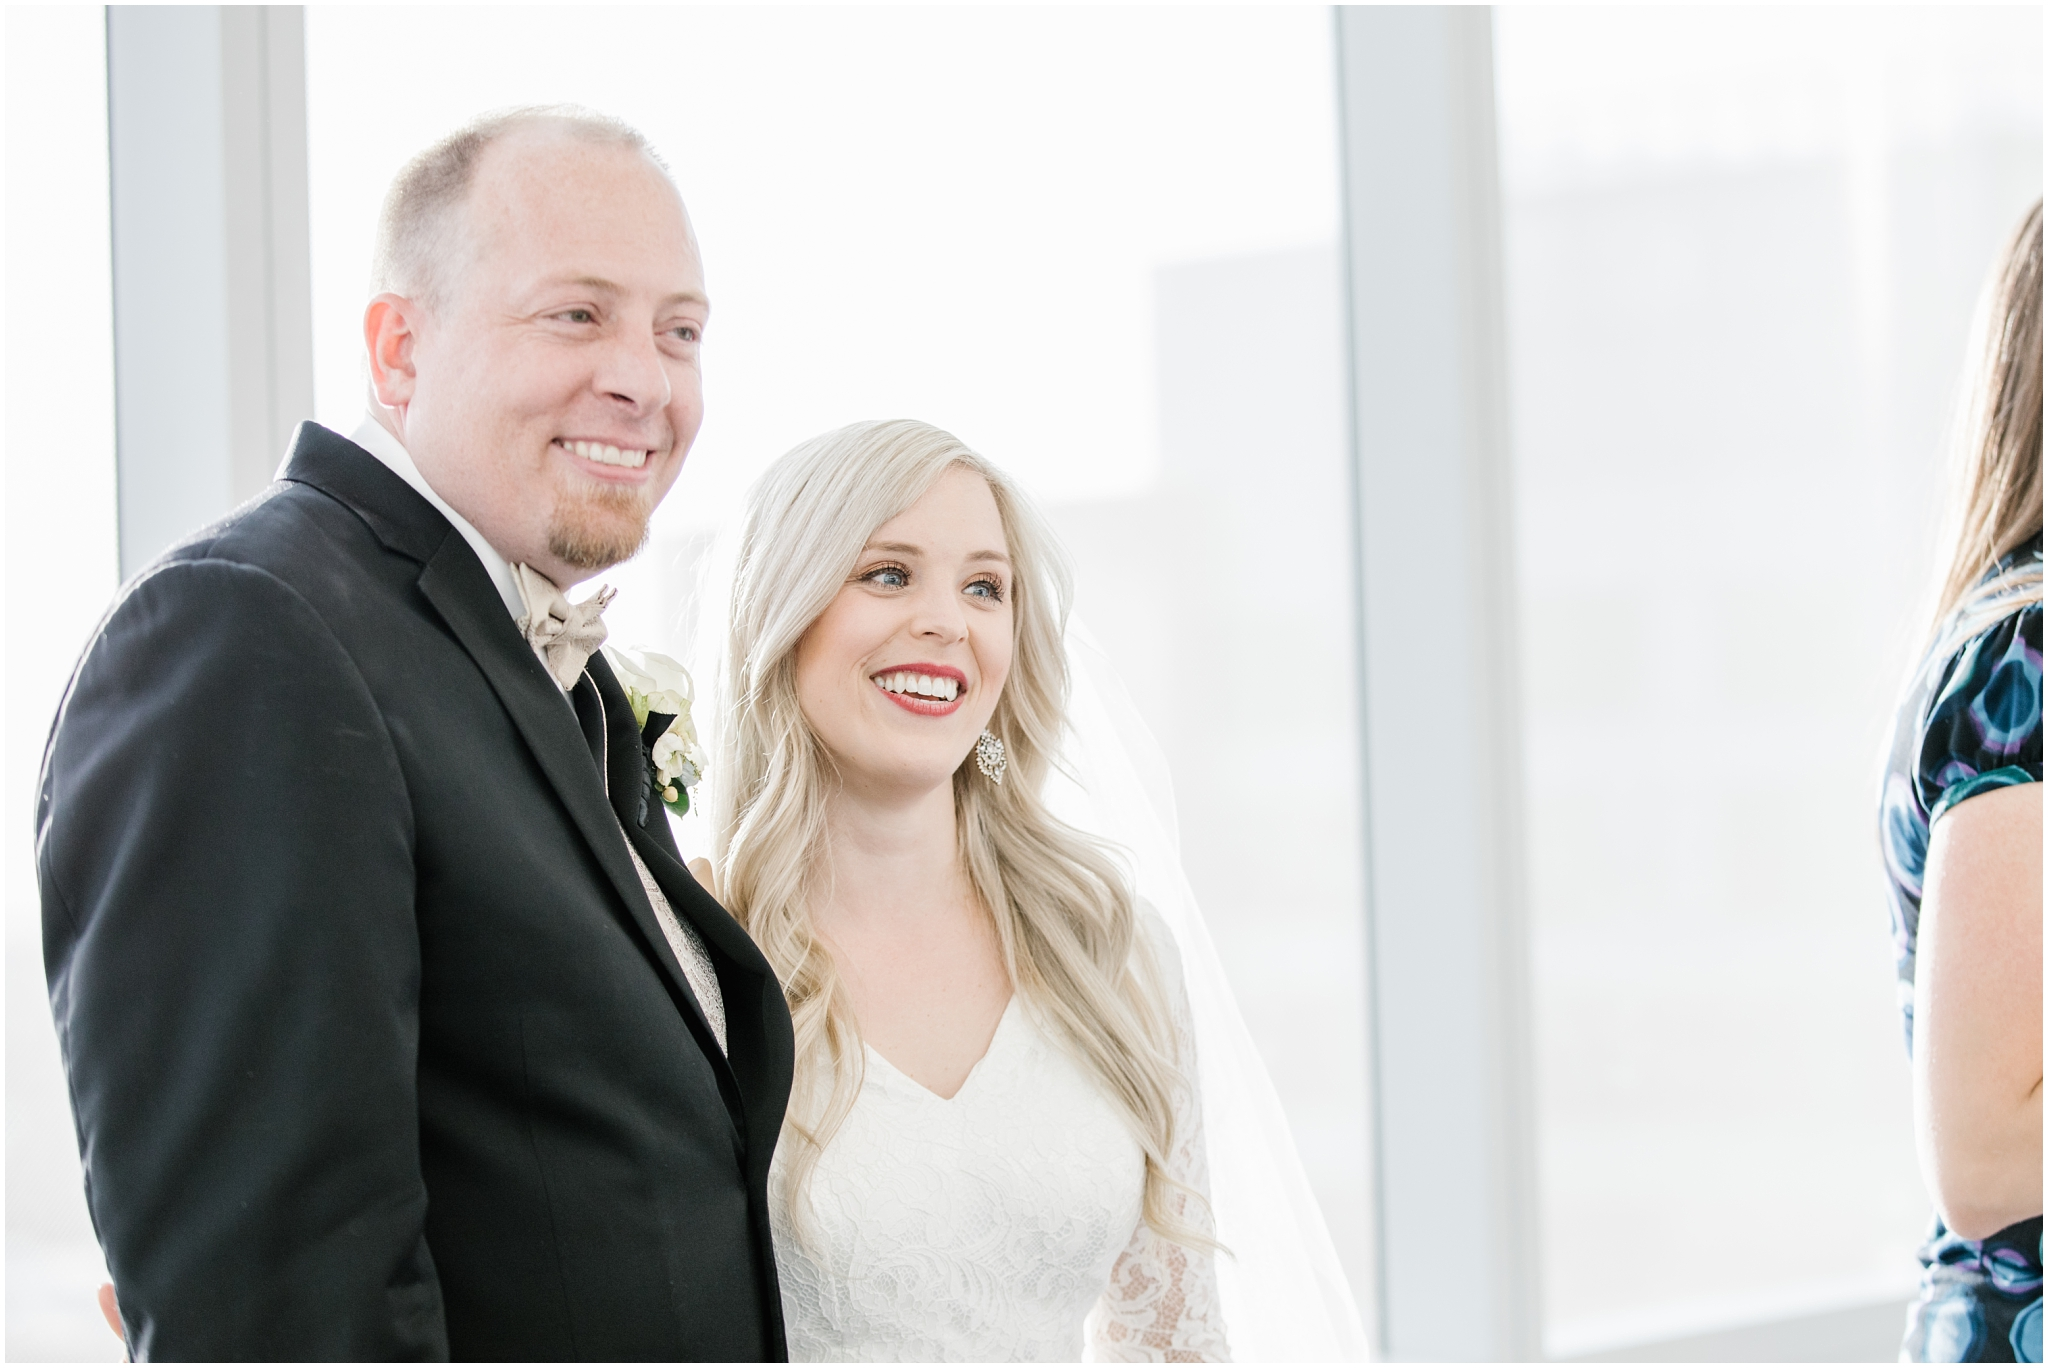 CherylandTyler-496_Lizzie-B-Imagery-Utah-Wedding-Photographer-Salt-Lake-City-Temple-Wells-Fargo-Building-Reception.jpg